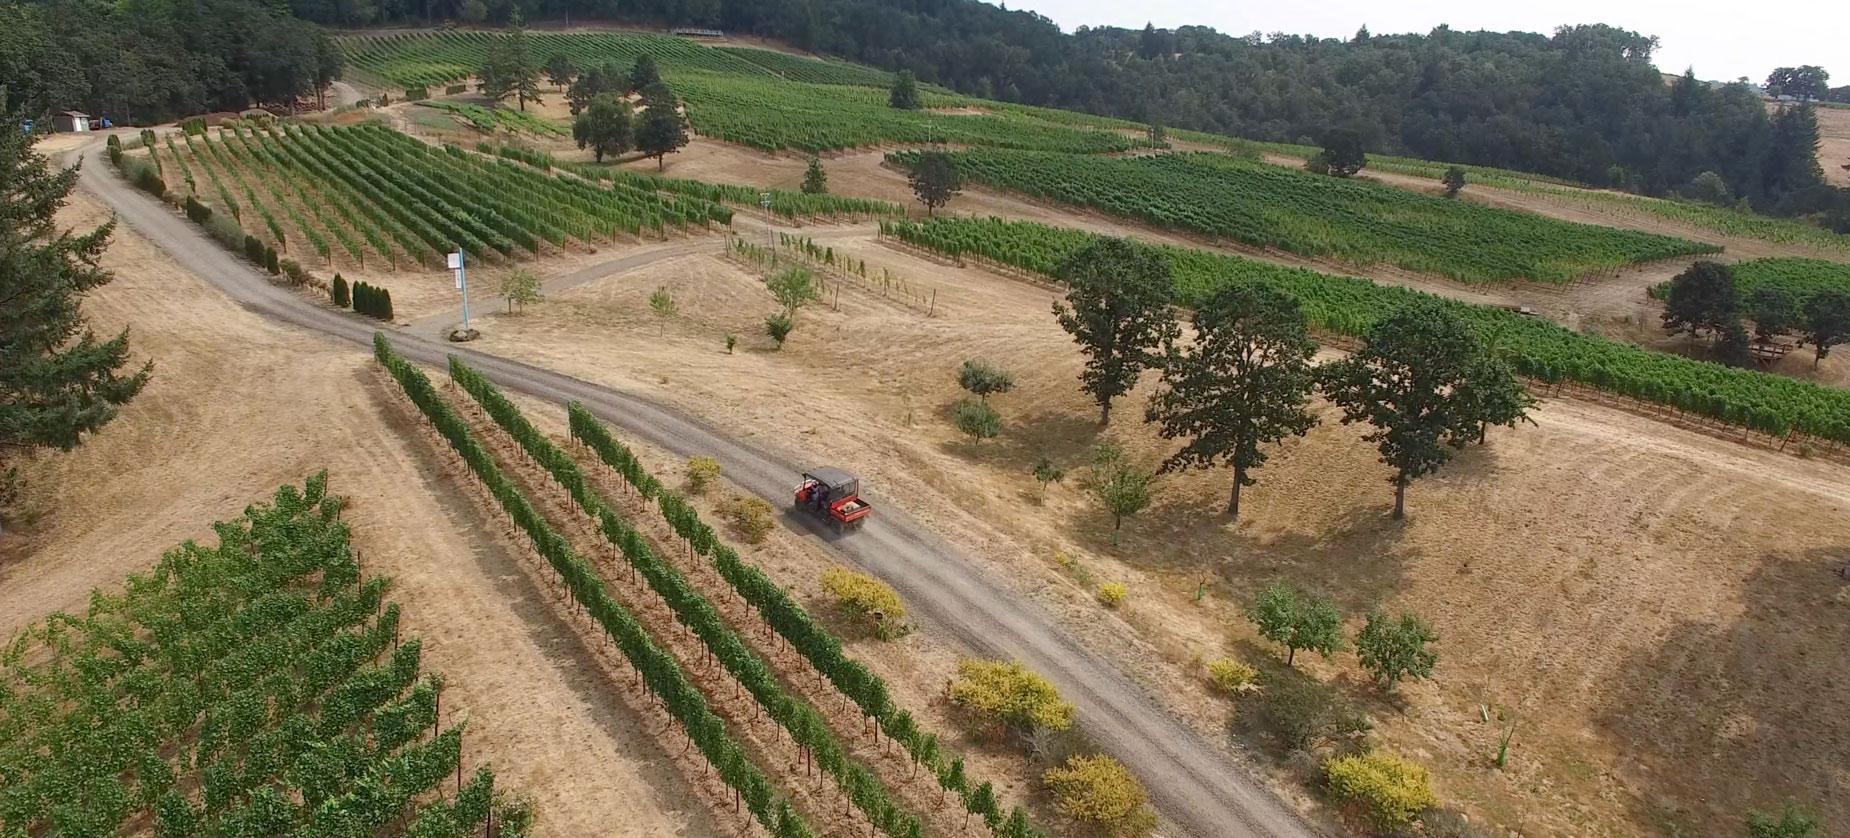 Keeler Estate Vineyard Experiences